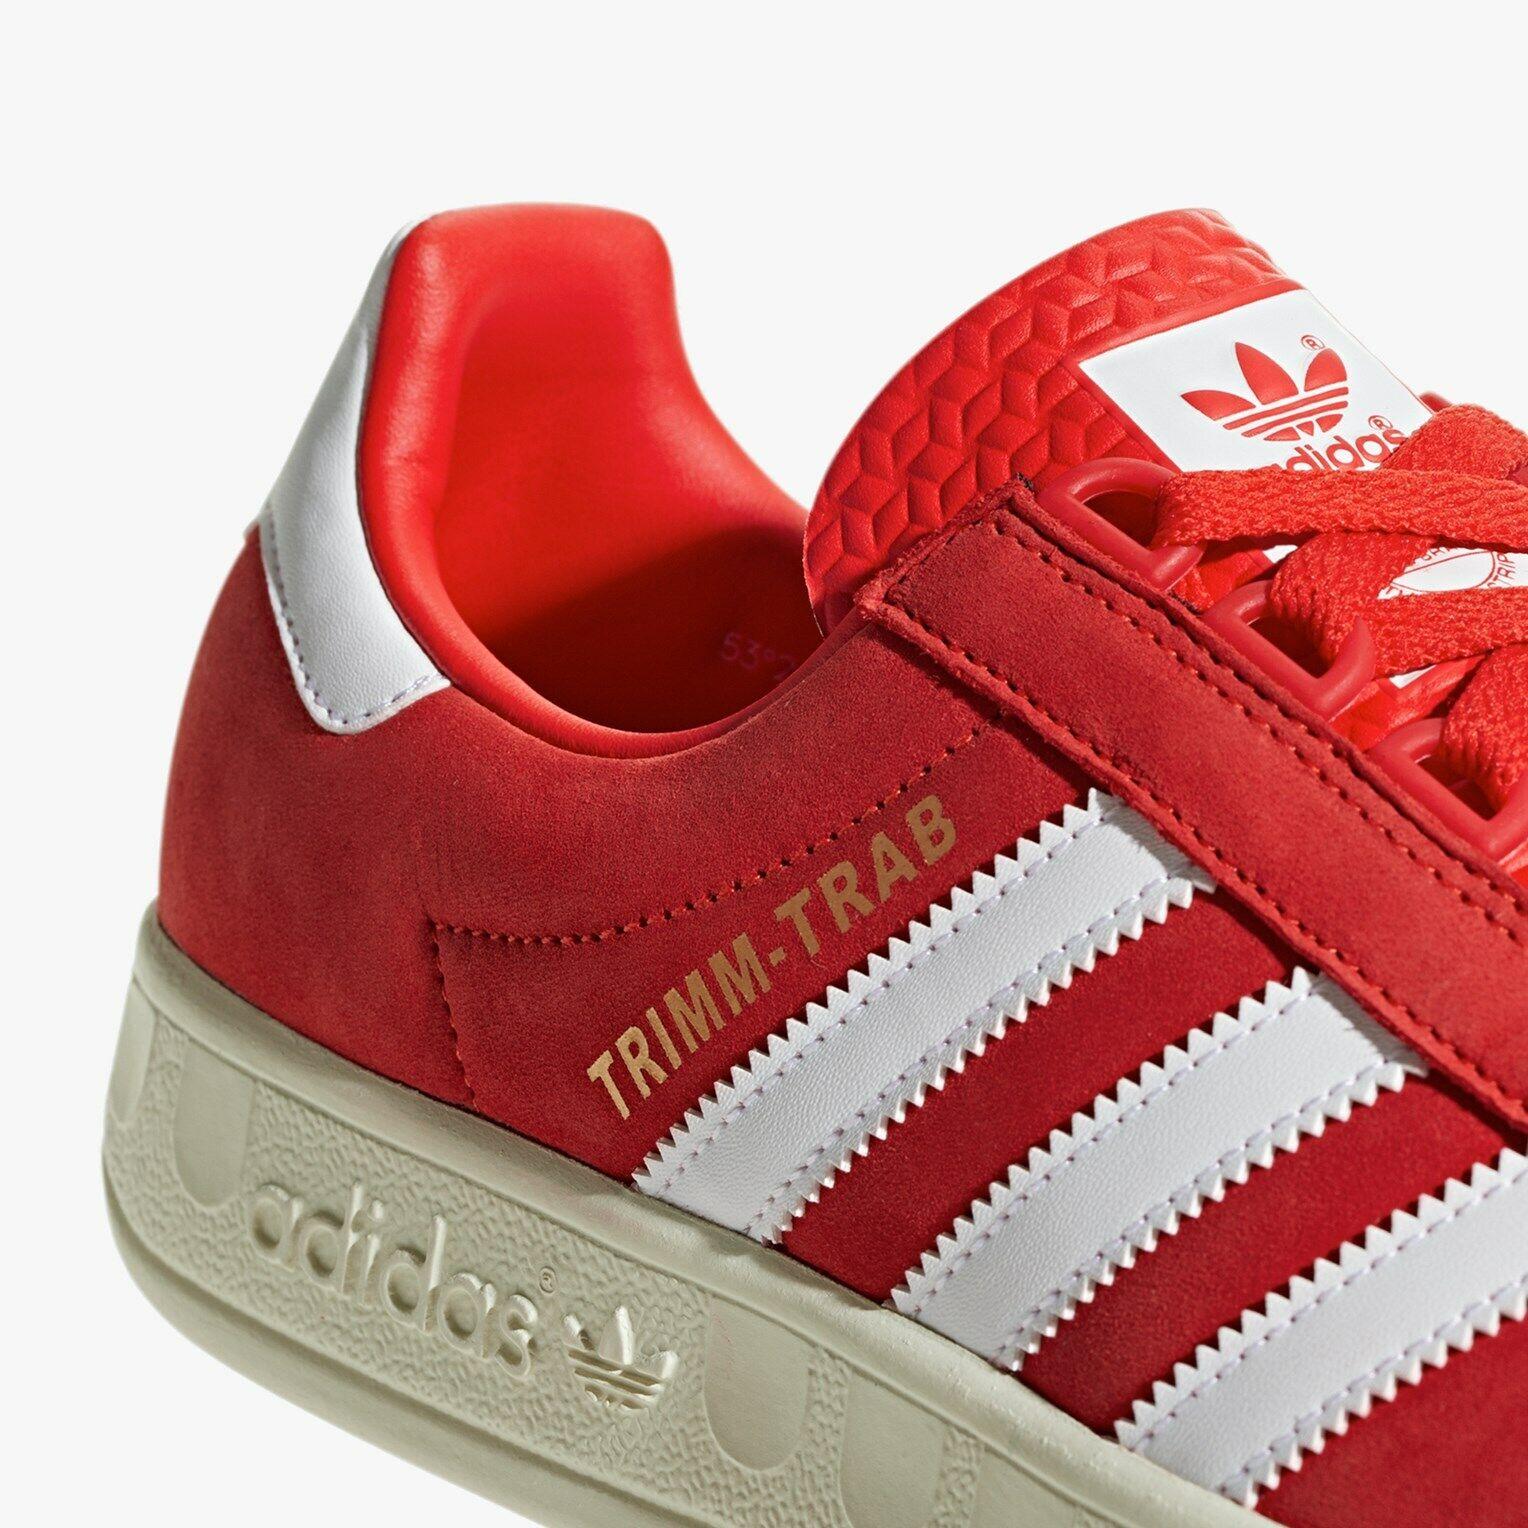 EntièreHommest neuf dans sa boîte Adidas Trimm Trab UK 10 Pack Rivalry Merseyside rouge BD7629